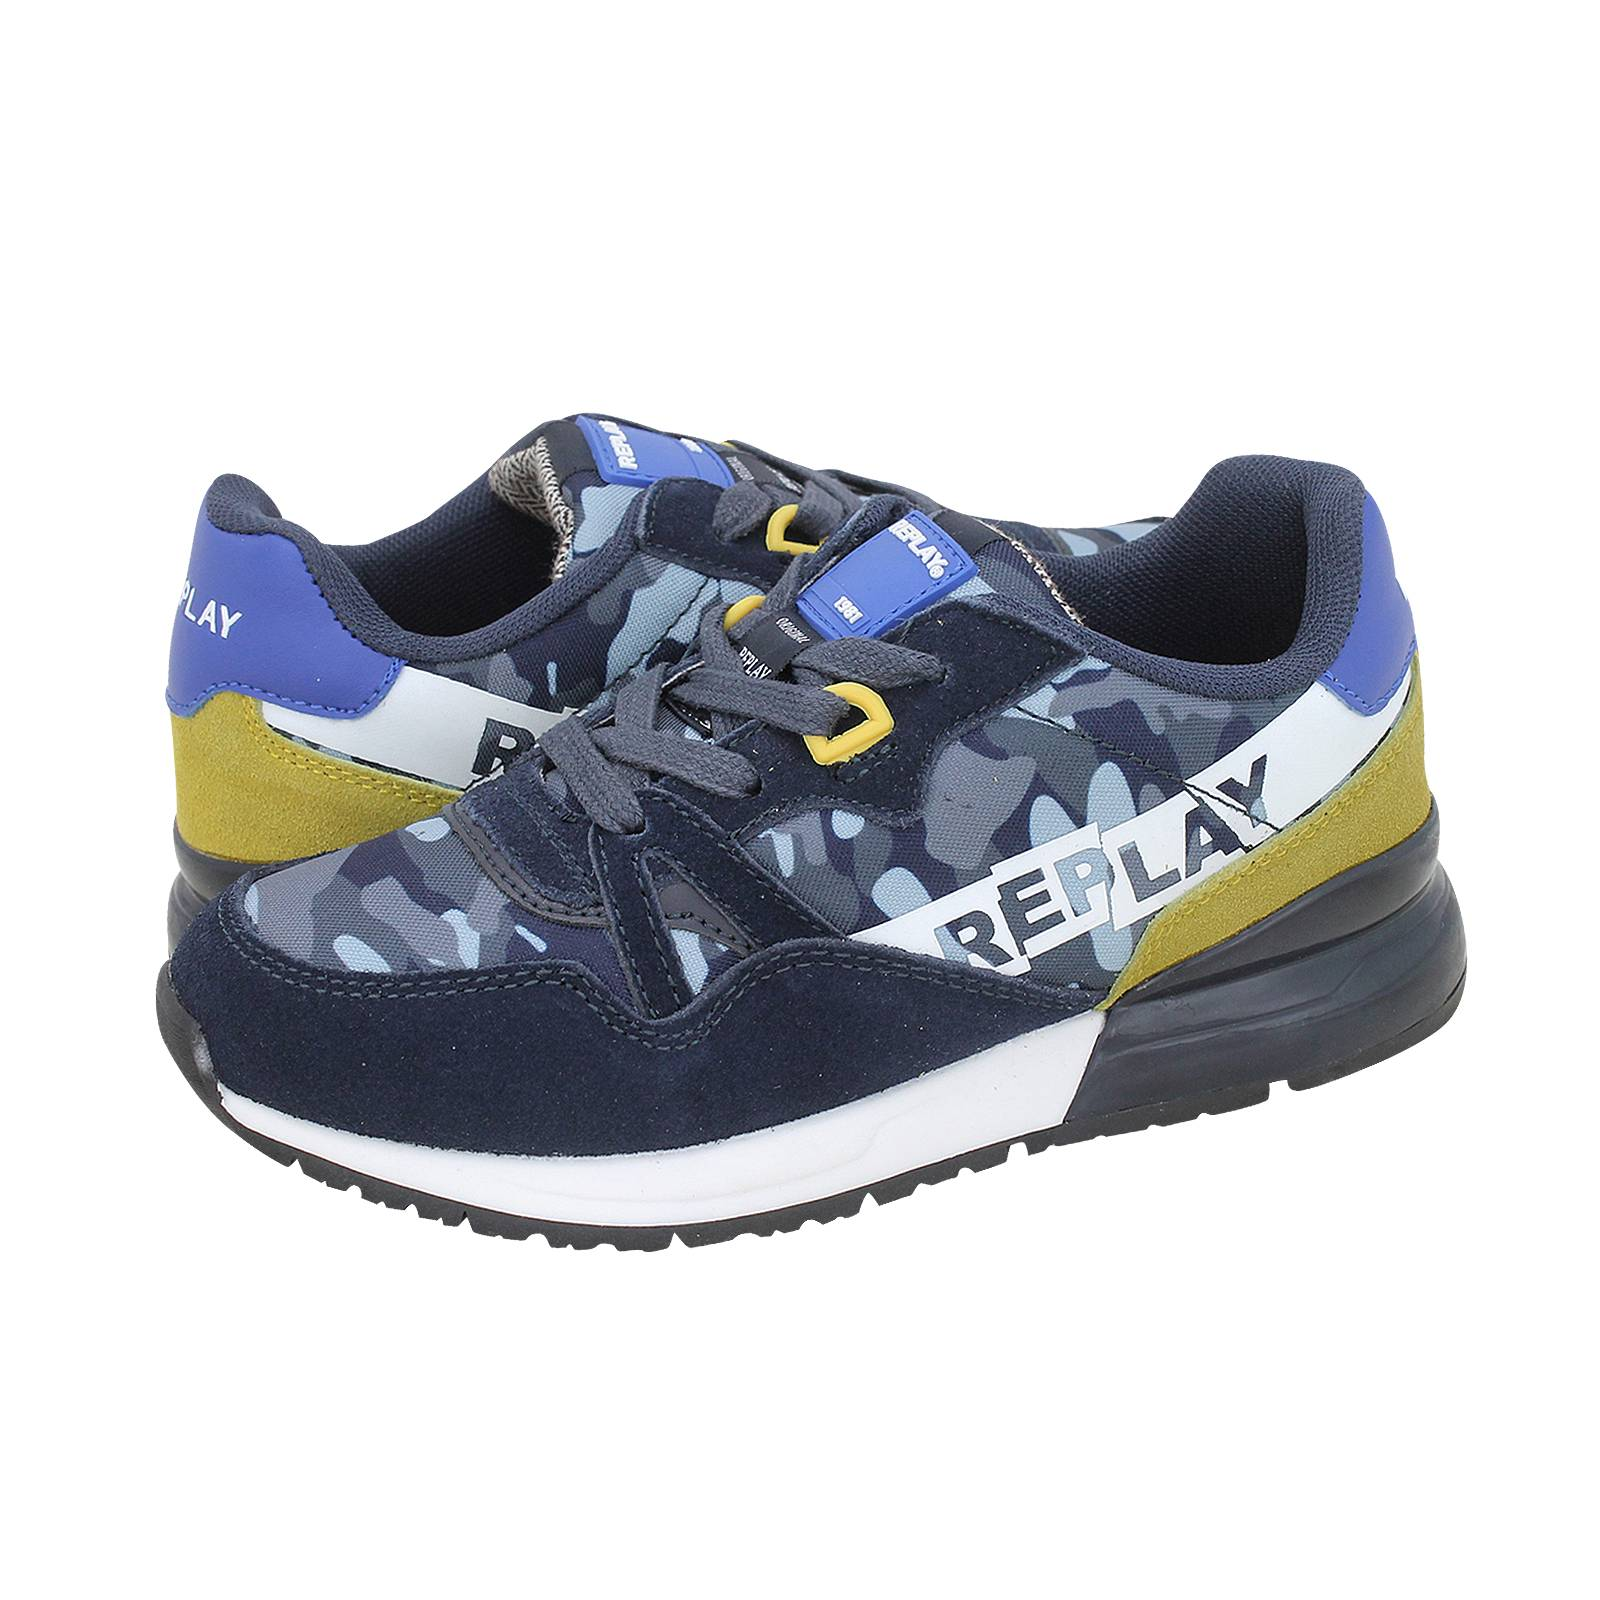 Kazuki L - Replay Casual kids' shoes